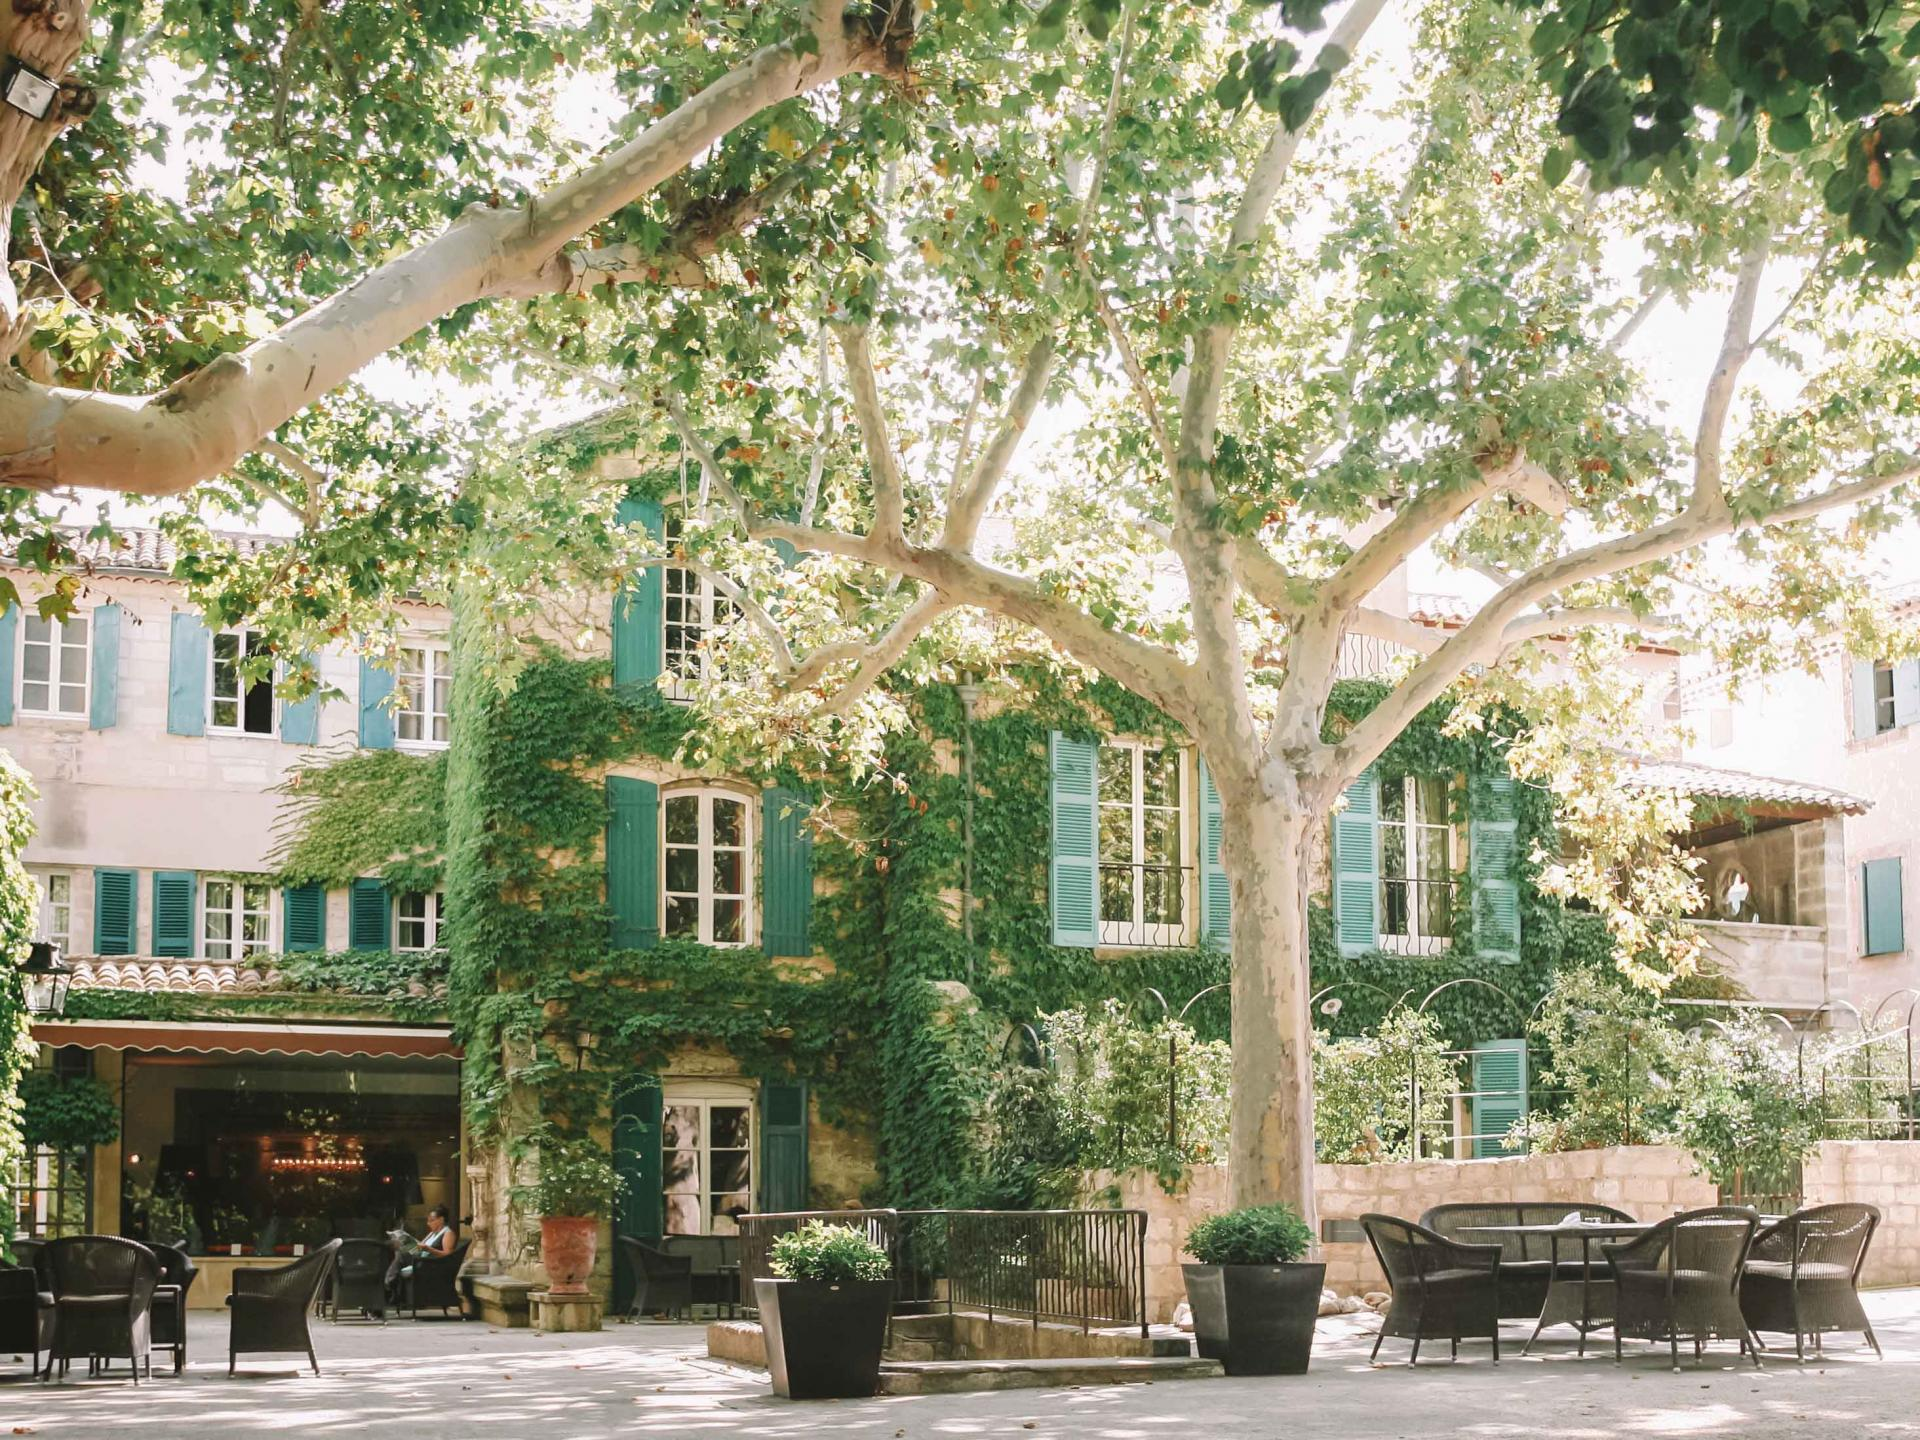 Le Prieuré, in Provence near Avignon